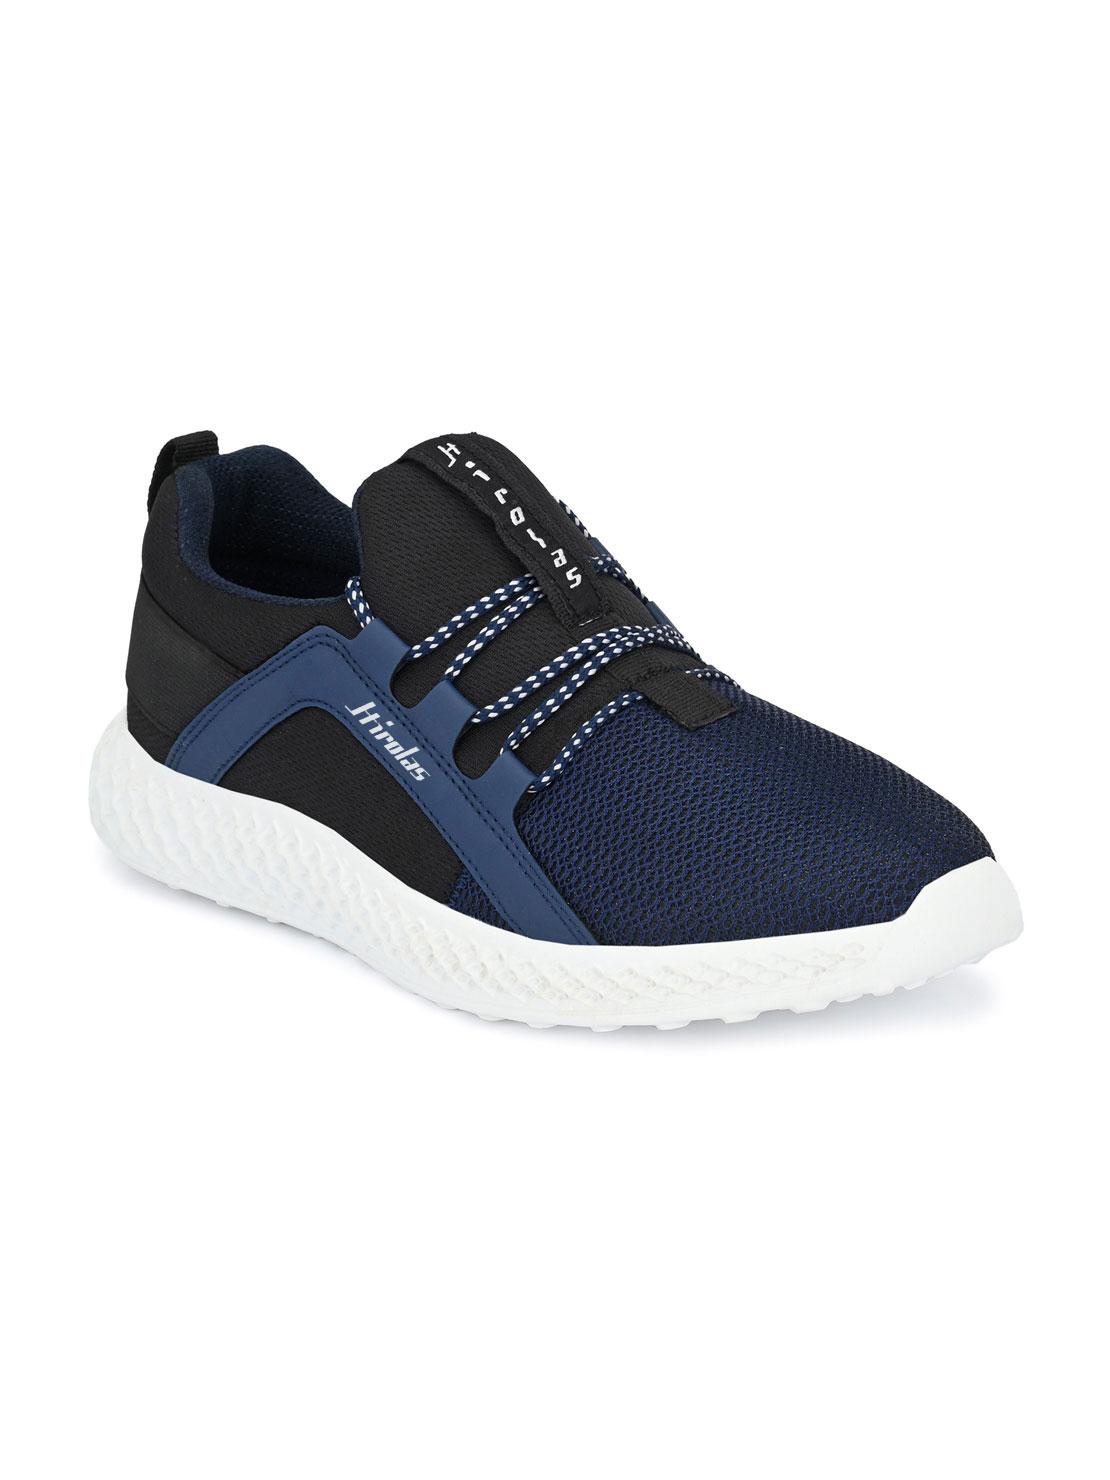 Hirolas | Hirolas® Men's Mesh Navy Running/Walking/Gym Sports Sneaker Shoes